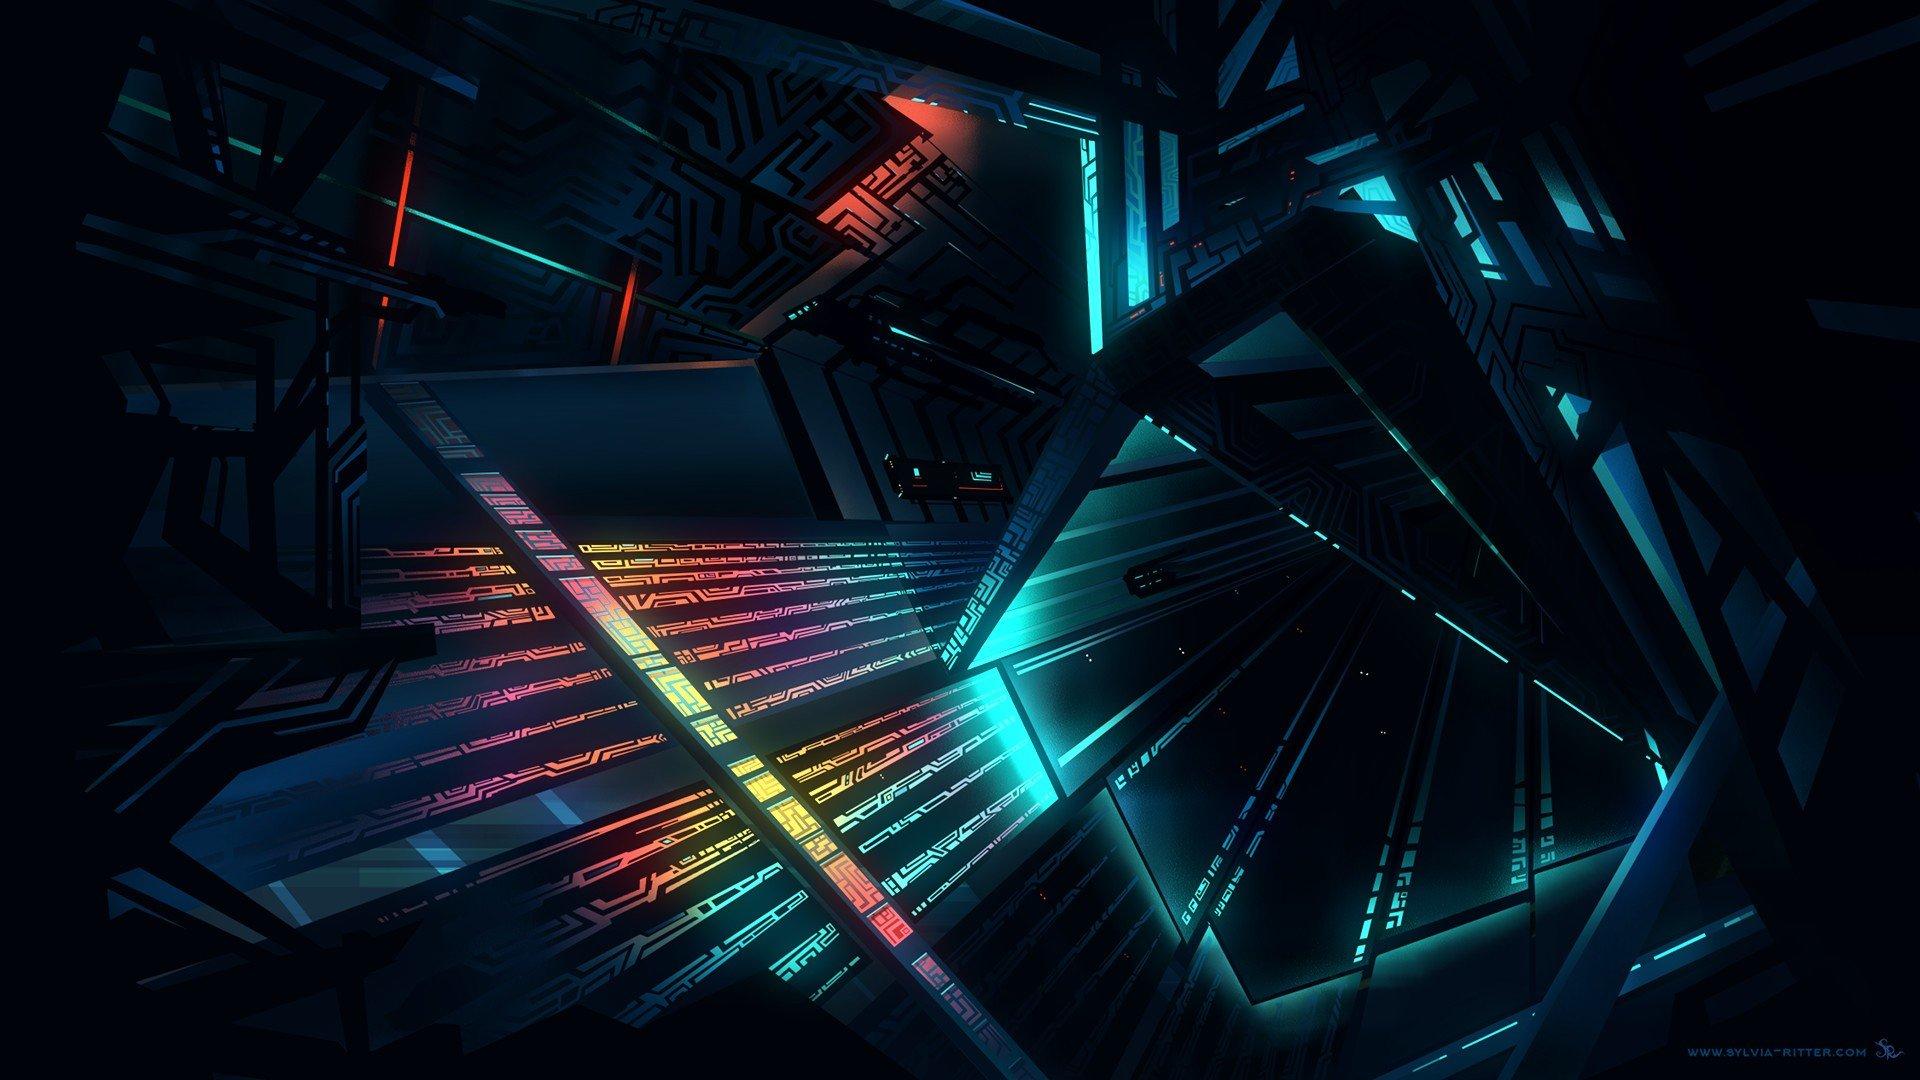 Architecture, Glowing, Futuristic HD Wallpapers / Desktop